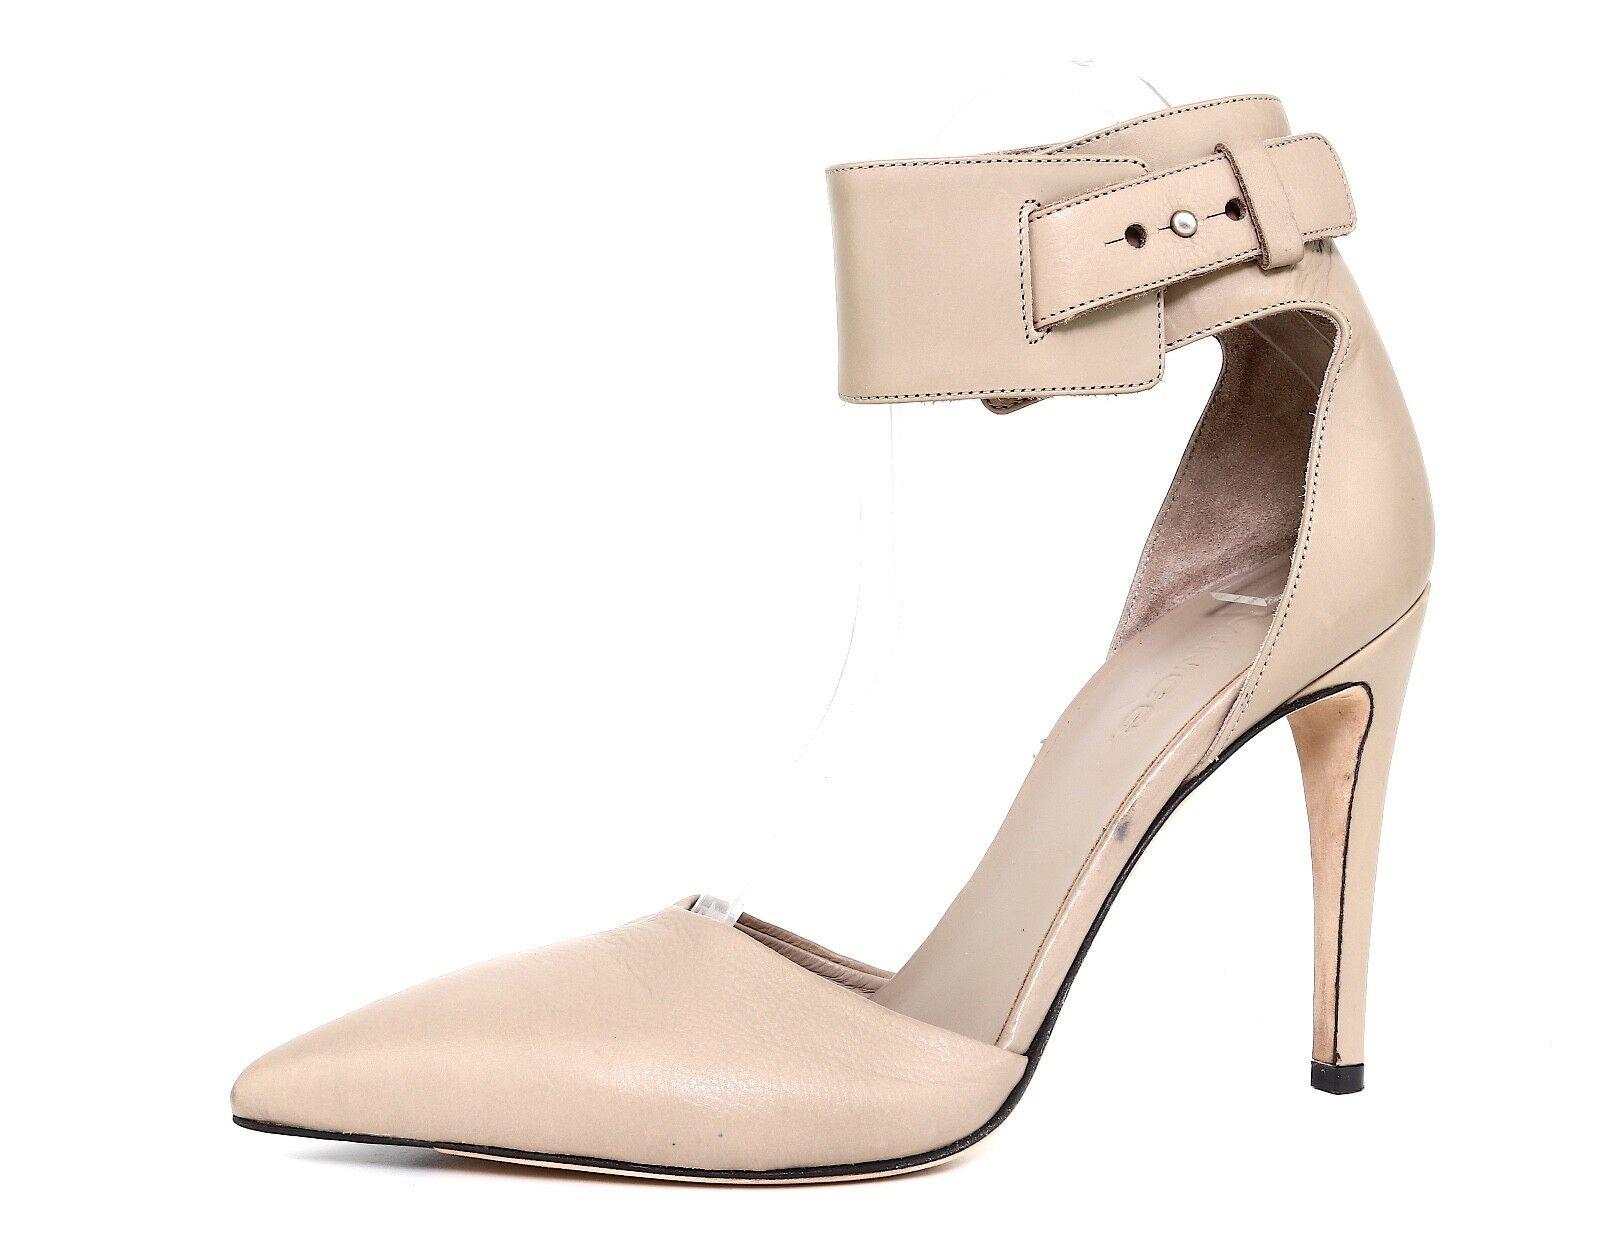 scelta migliore Vince Ada Ada Ada Ankle Strap Leather Pump Beige donna Sz 8 M 1314  il più recente